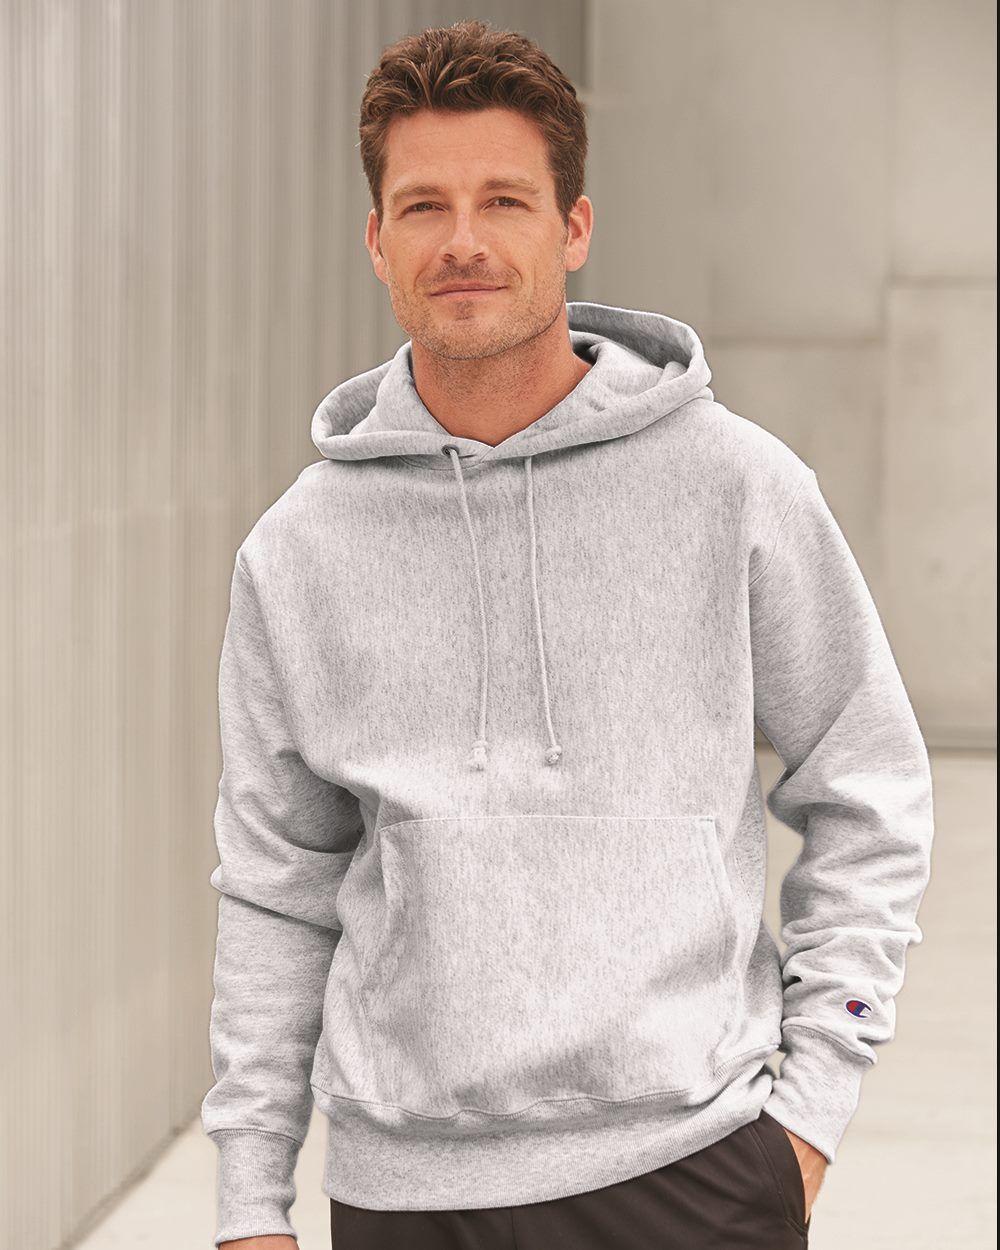 Champion S1051 12 Oz Reverse Weave Fleece Hoodie Champion Clothing Sweatshirts Sweatshirts Hoodie [ 1463 x 975 Pixel ]